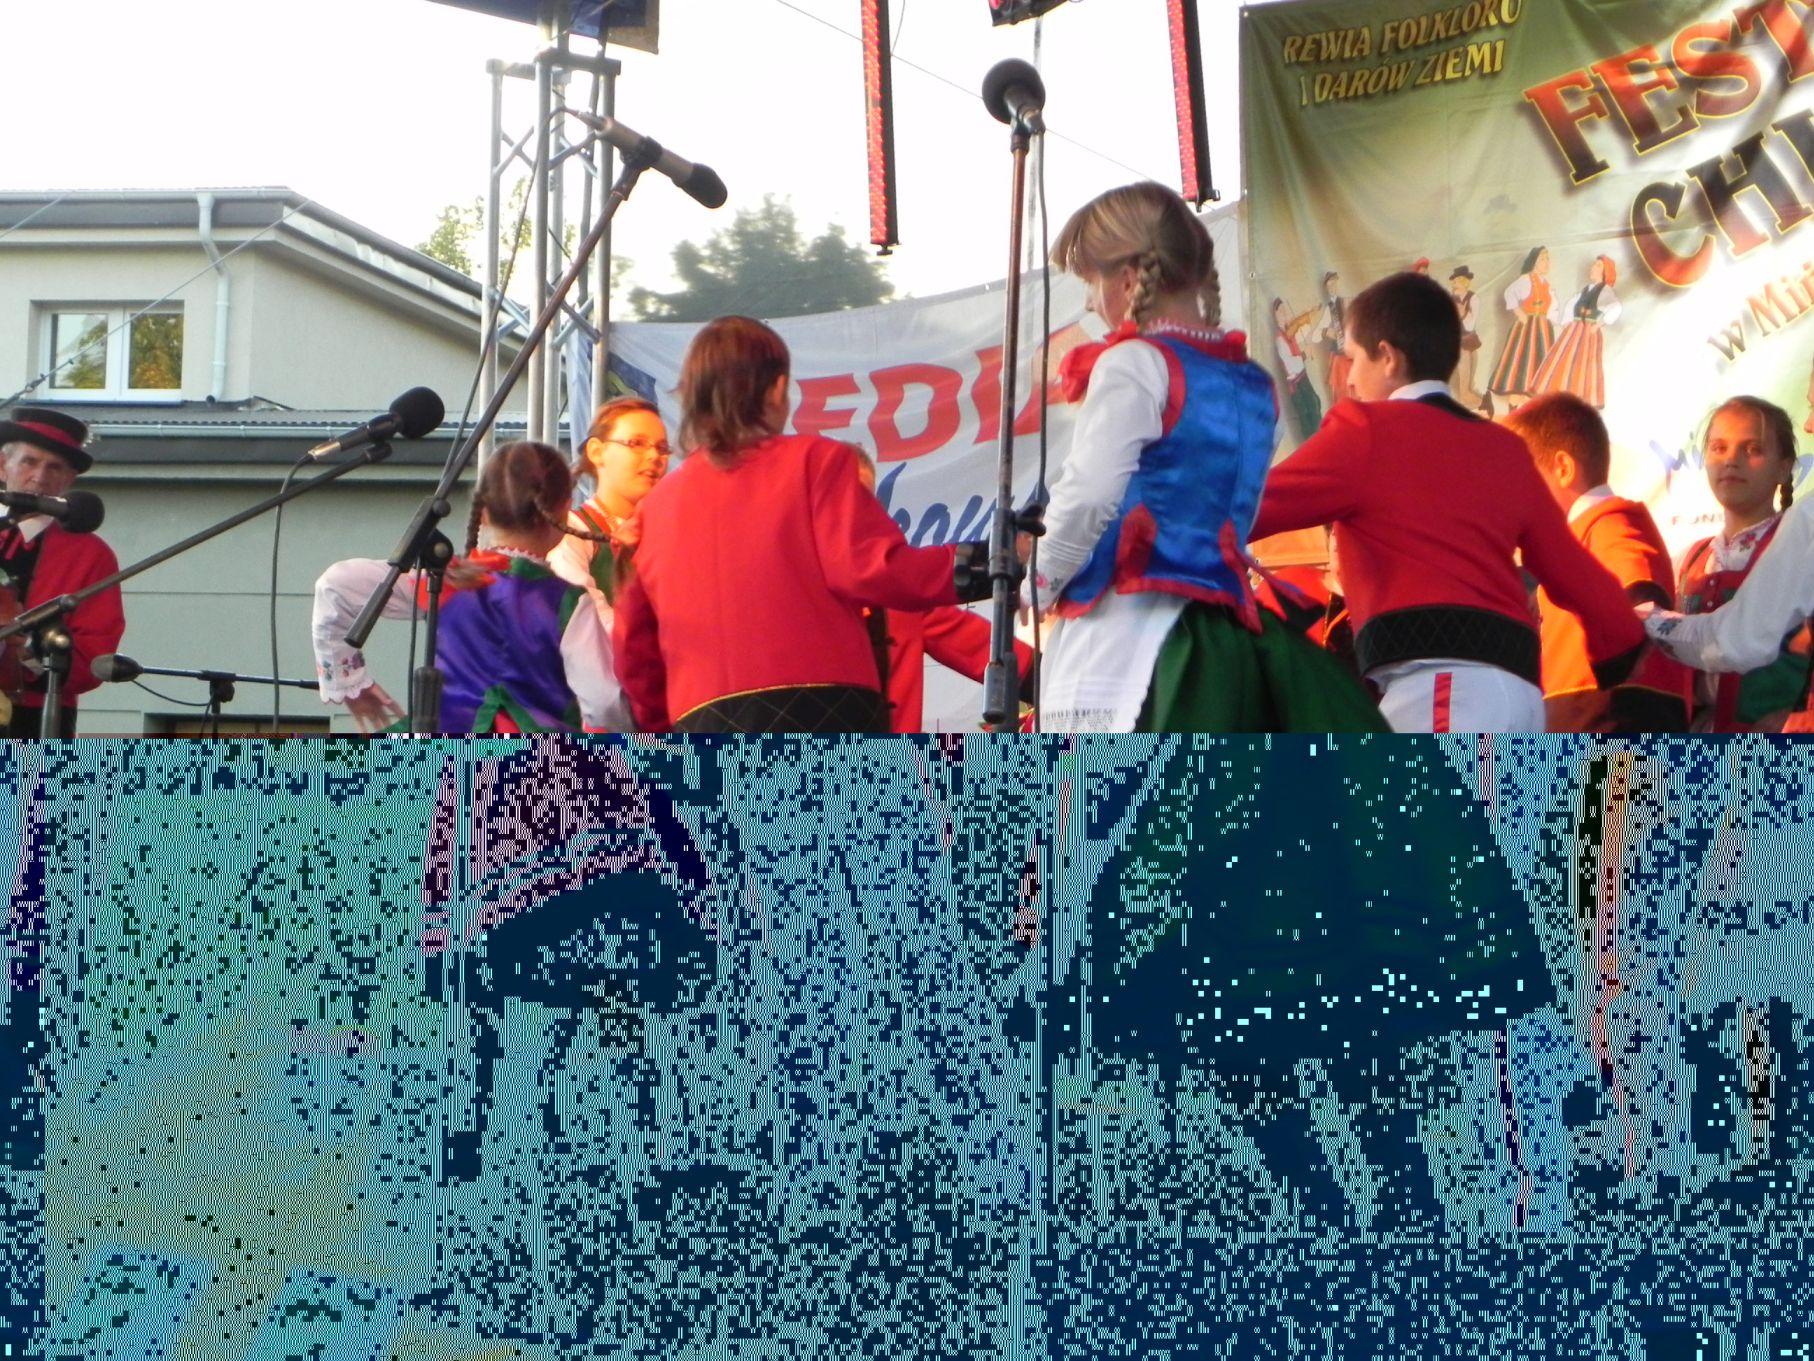 2013-09-10 Festyn - Mińsk Maz (175)